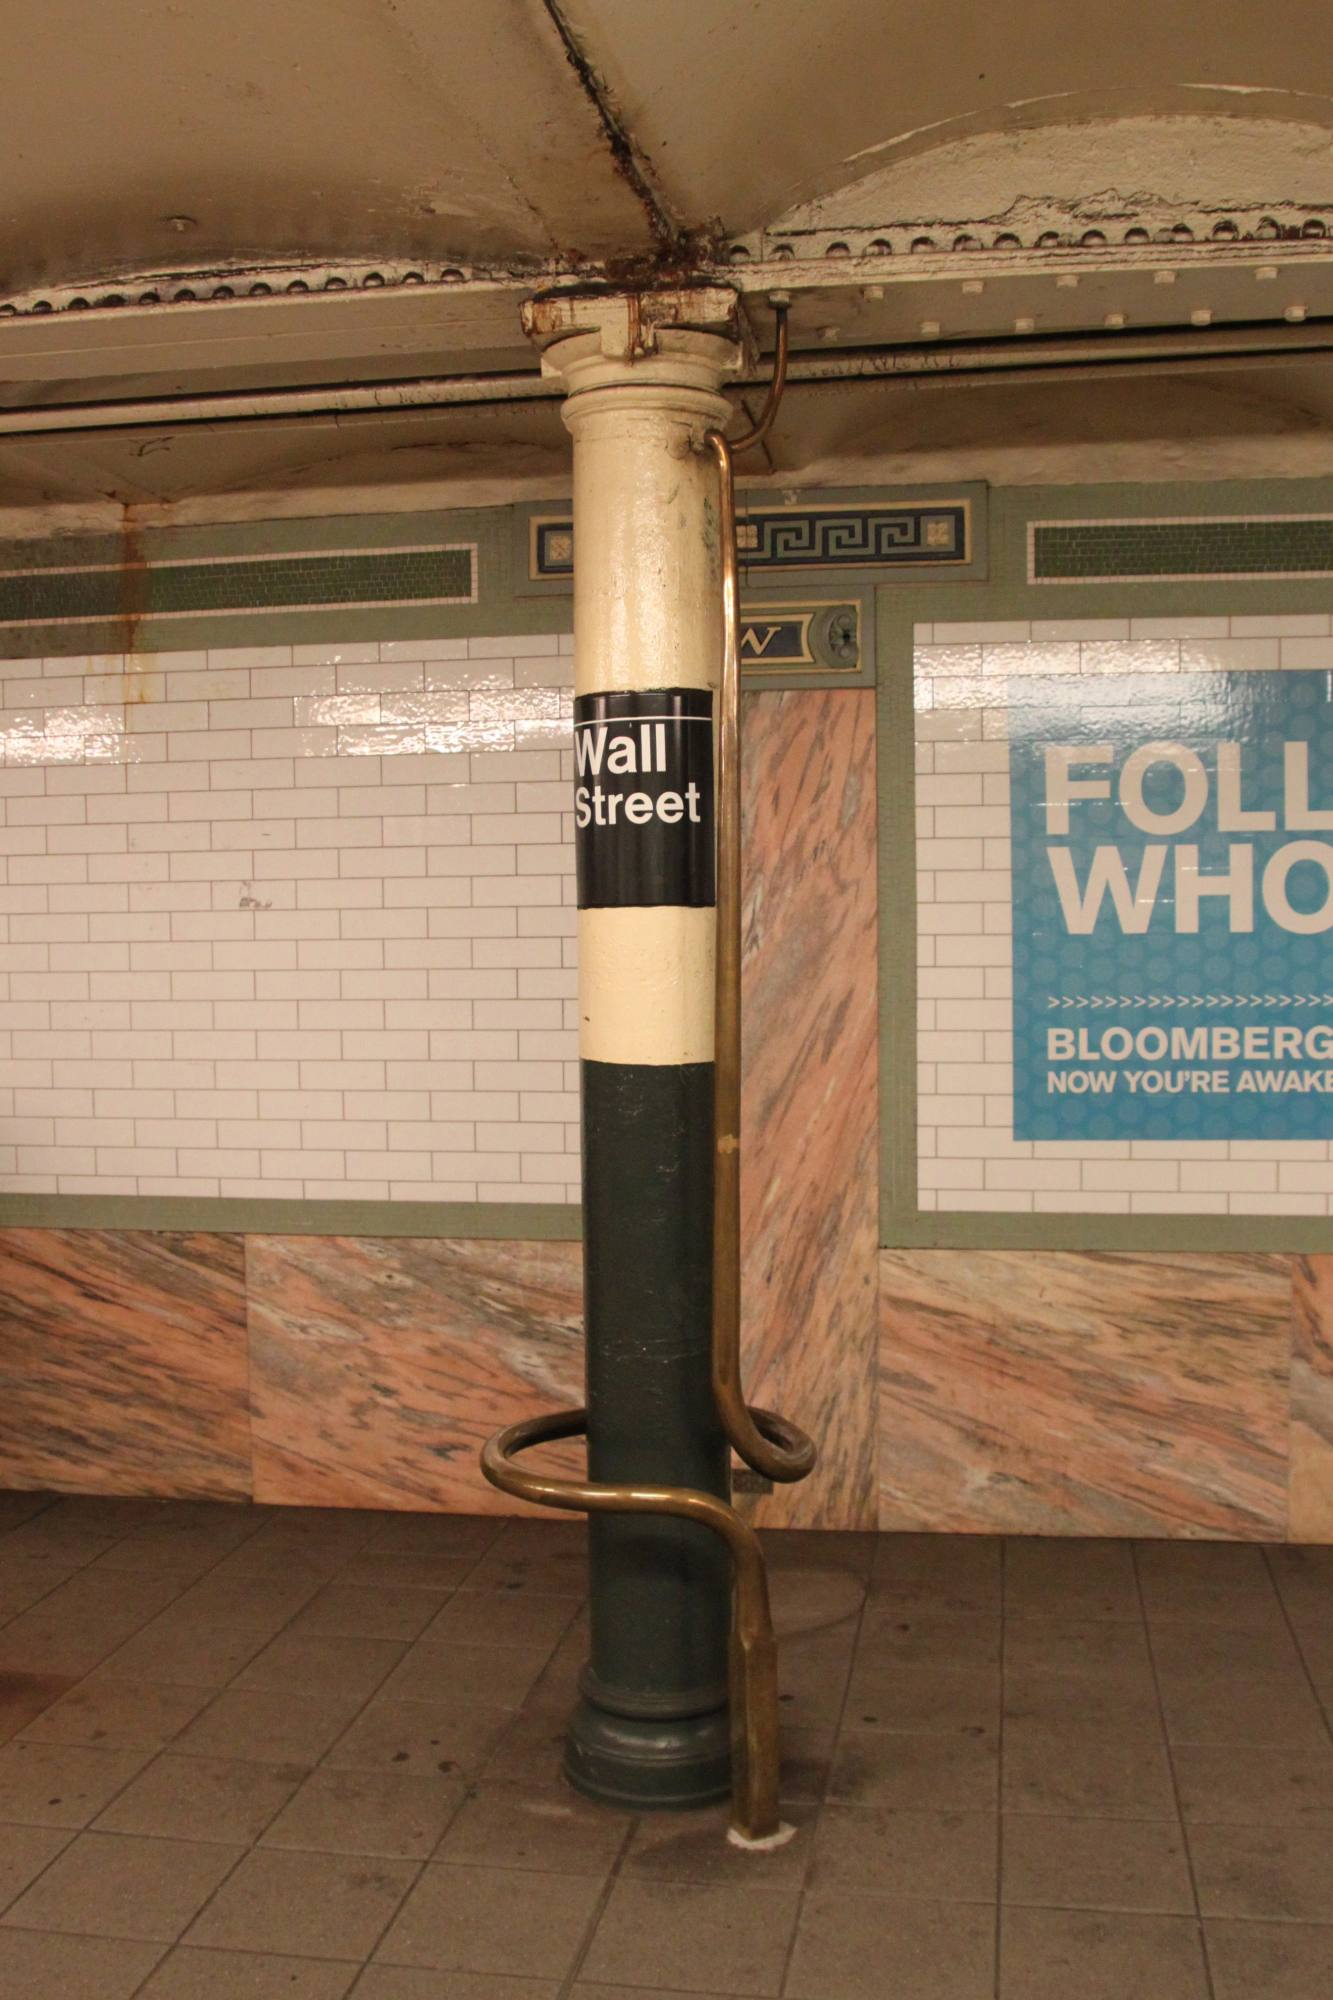 (241k, 1333x2000)<br><b>Country:</b> United States<br><b>City:</b> New York<br><b>System:</b> New York City Transit<br><b>Line:</b> IRT East Side Line<br><b>Location:</b> Wall Street<br><b>Photo by:</b> Robbie Rosenfeld<br><b>Date:</b> 9/25/2011<br><b>Artwork:</b> <i>Lariat Seat Loops</i>, James Garvey, 1997<br><b>Viewed (this week/total):</b> 3 / 2610